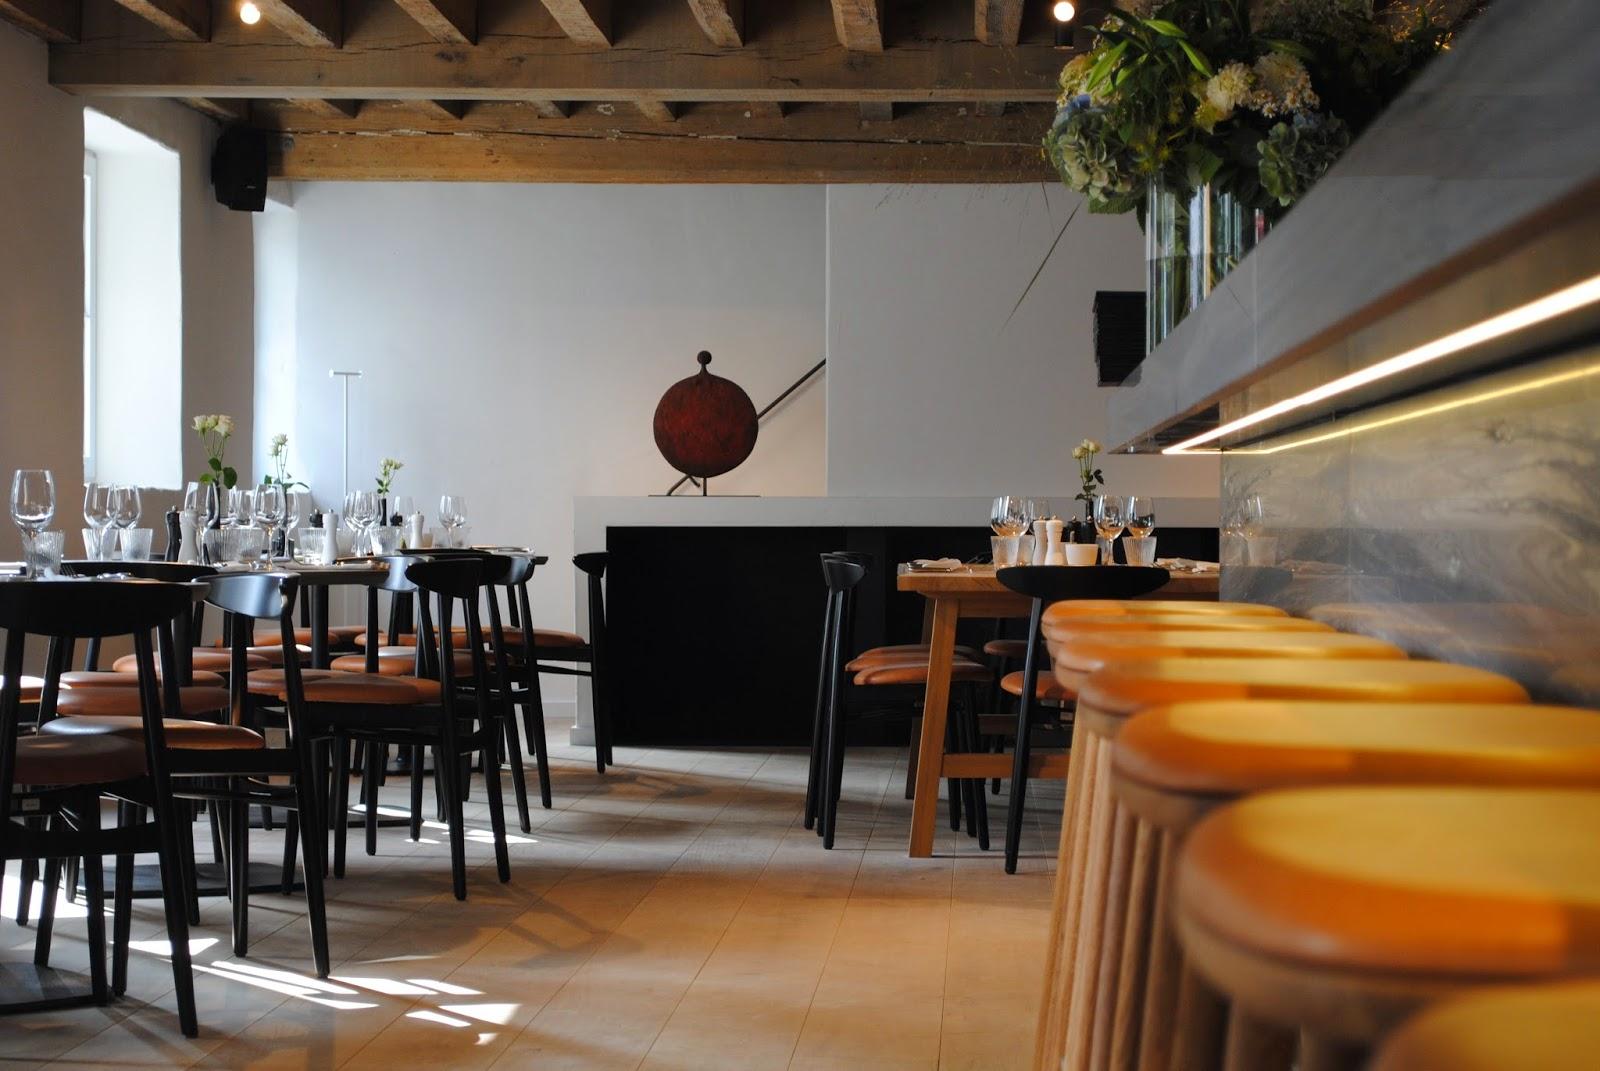 Brasserie m n 39 t eilandje antwerpen for Interieur antwerpen